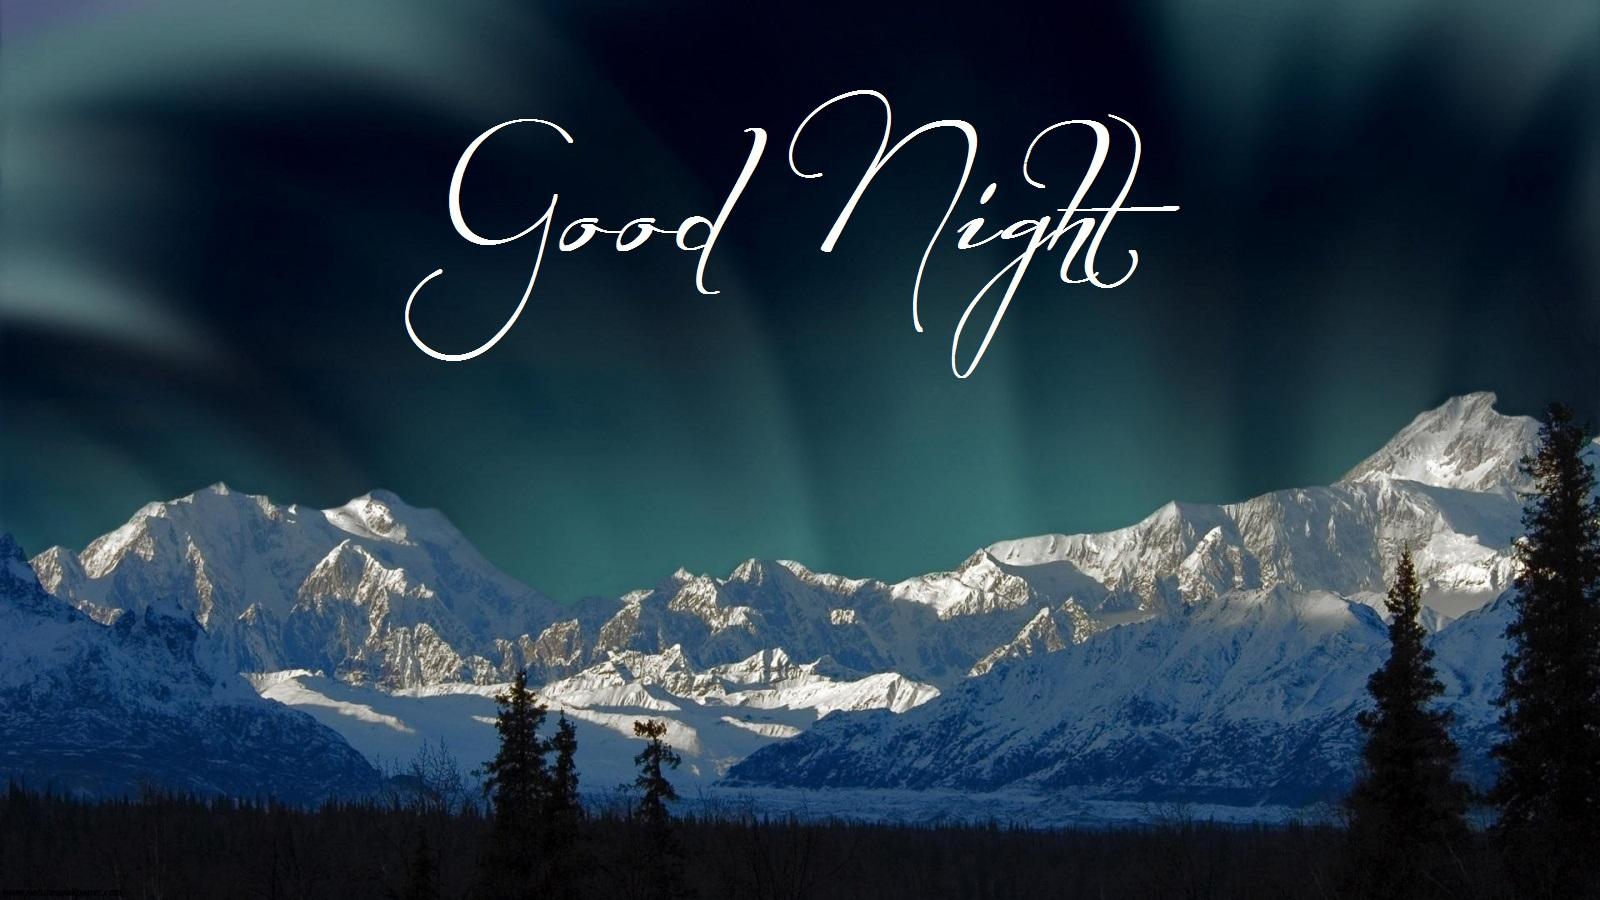 Image Good Night Wishes Wallpaper 1 Jpg The Secret Society